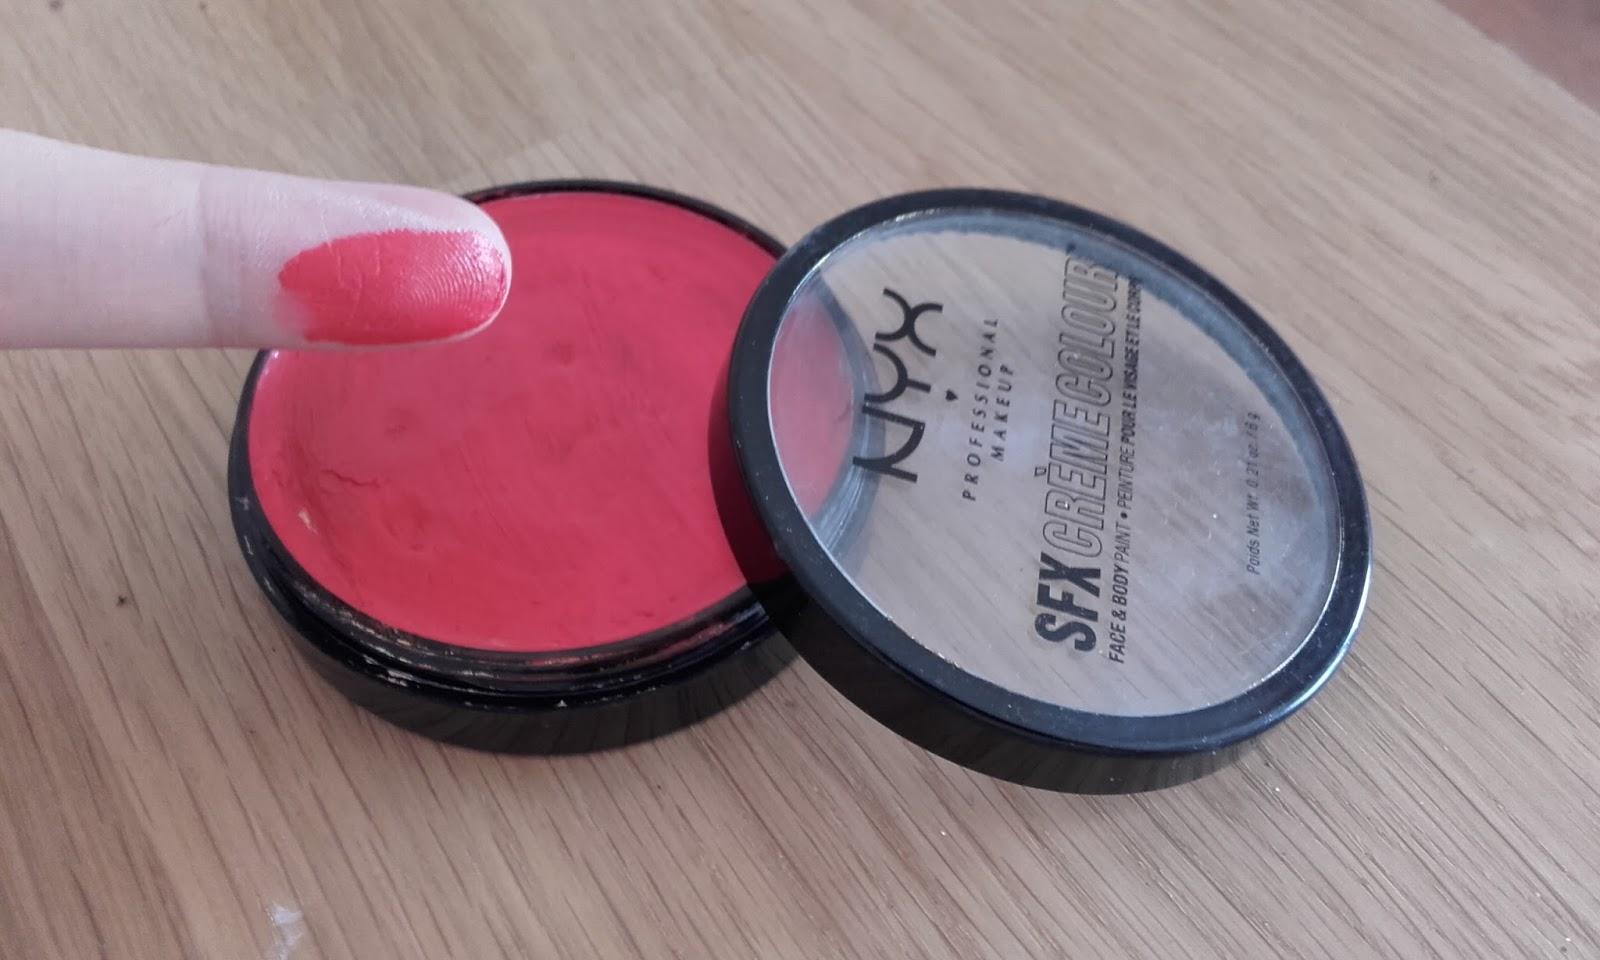 Blackarrot Sfx Creme Colour Od Nyx